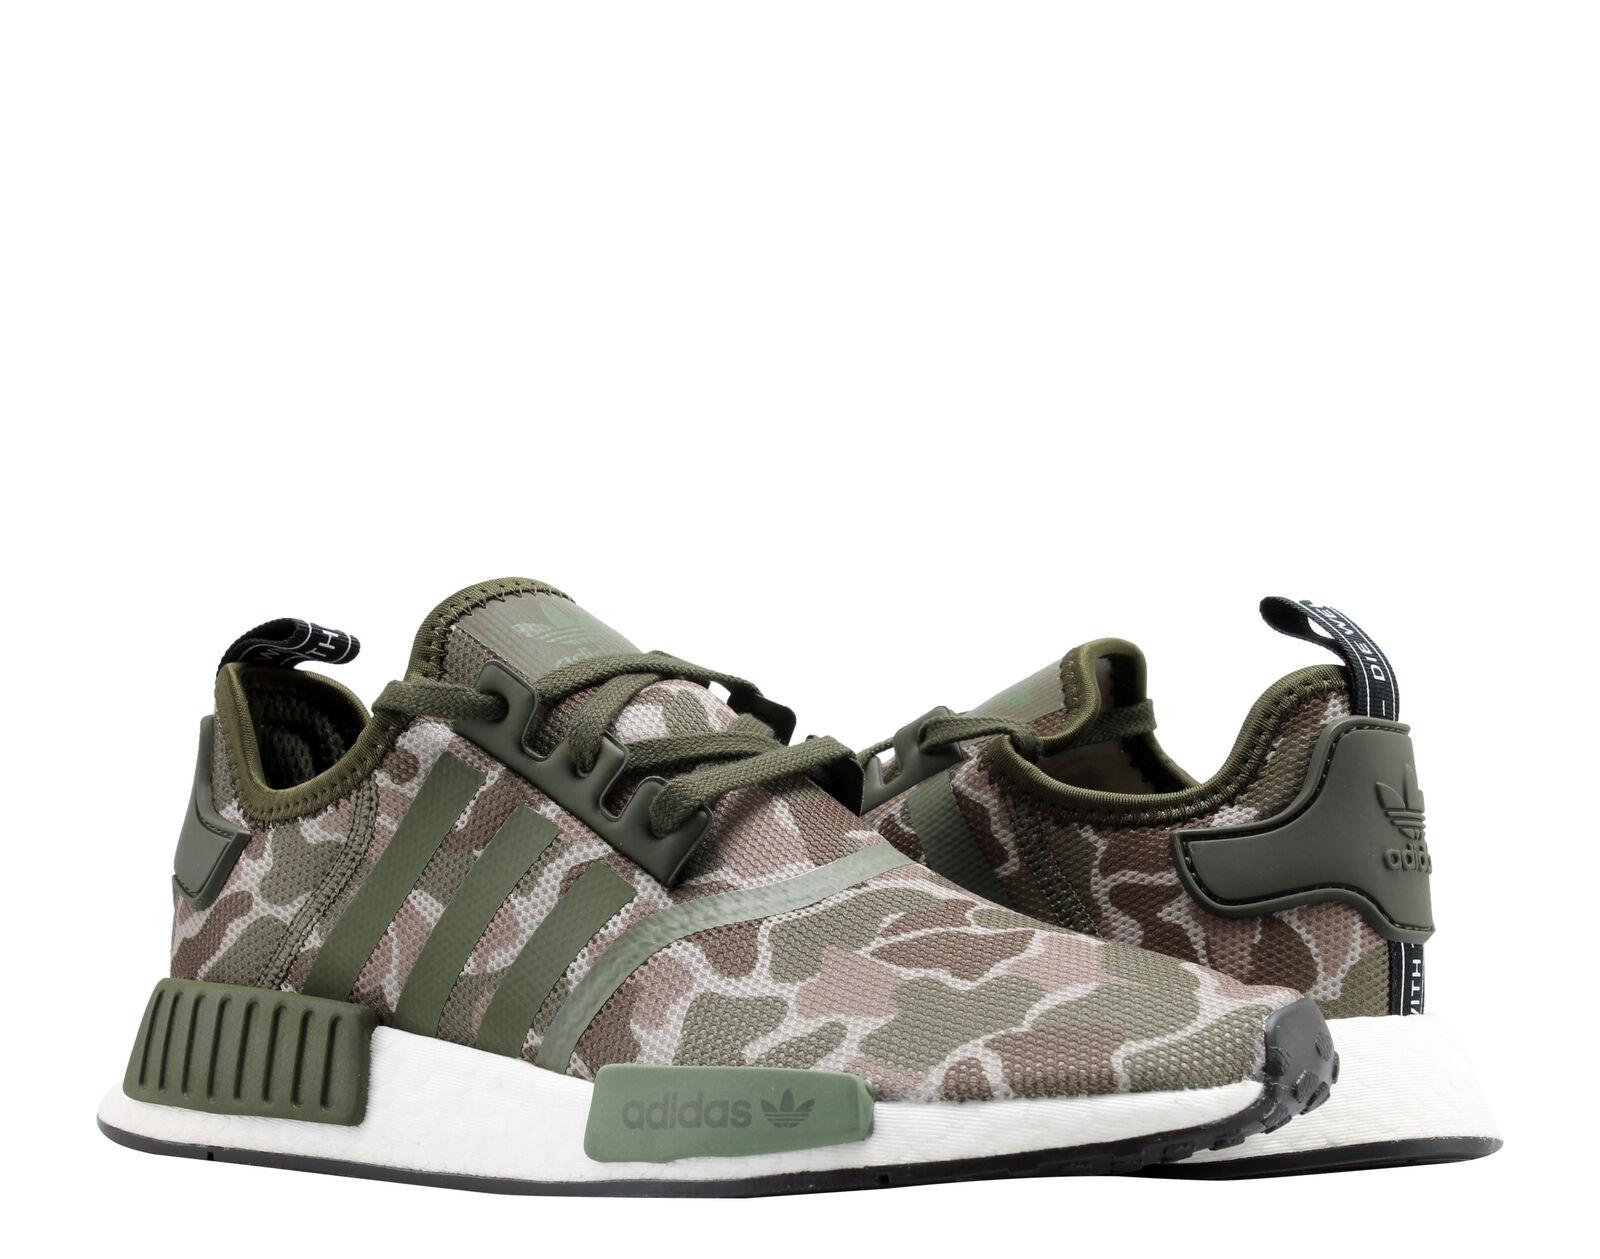 buy online 23d8c fae6a Adidas NMD_R1 Sesame/Steel/Base Green Duck Camo Men's Running Shoes D96617